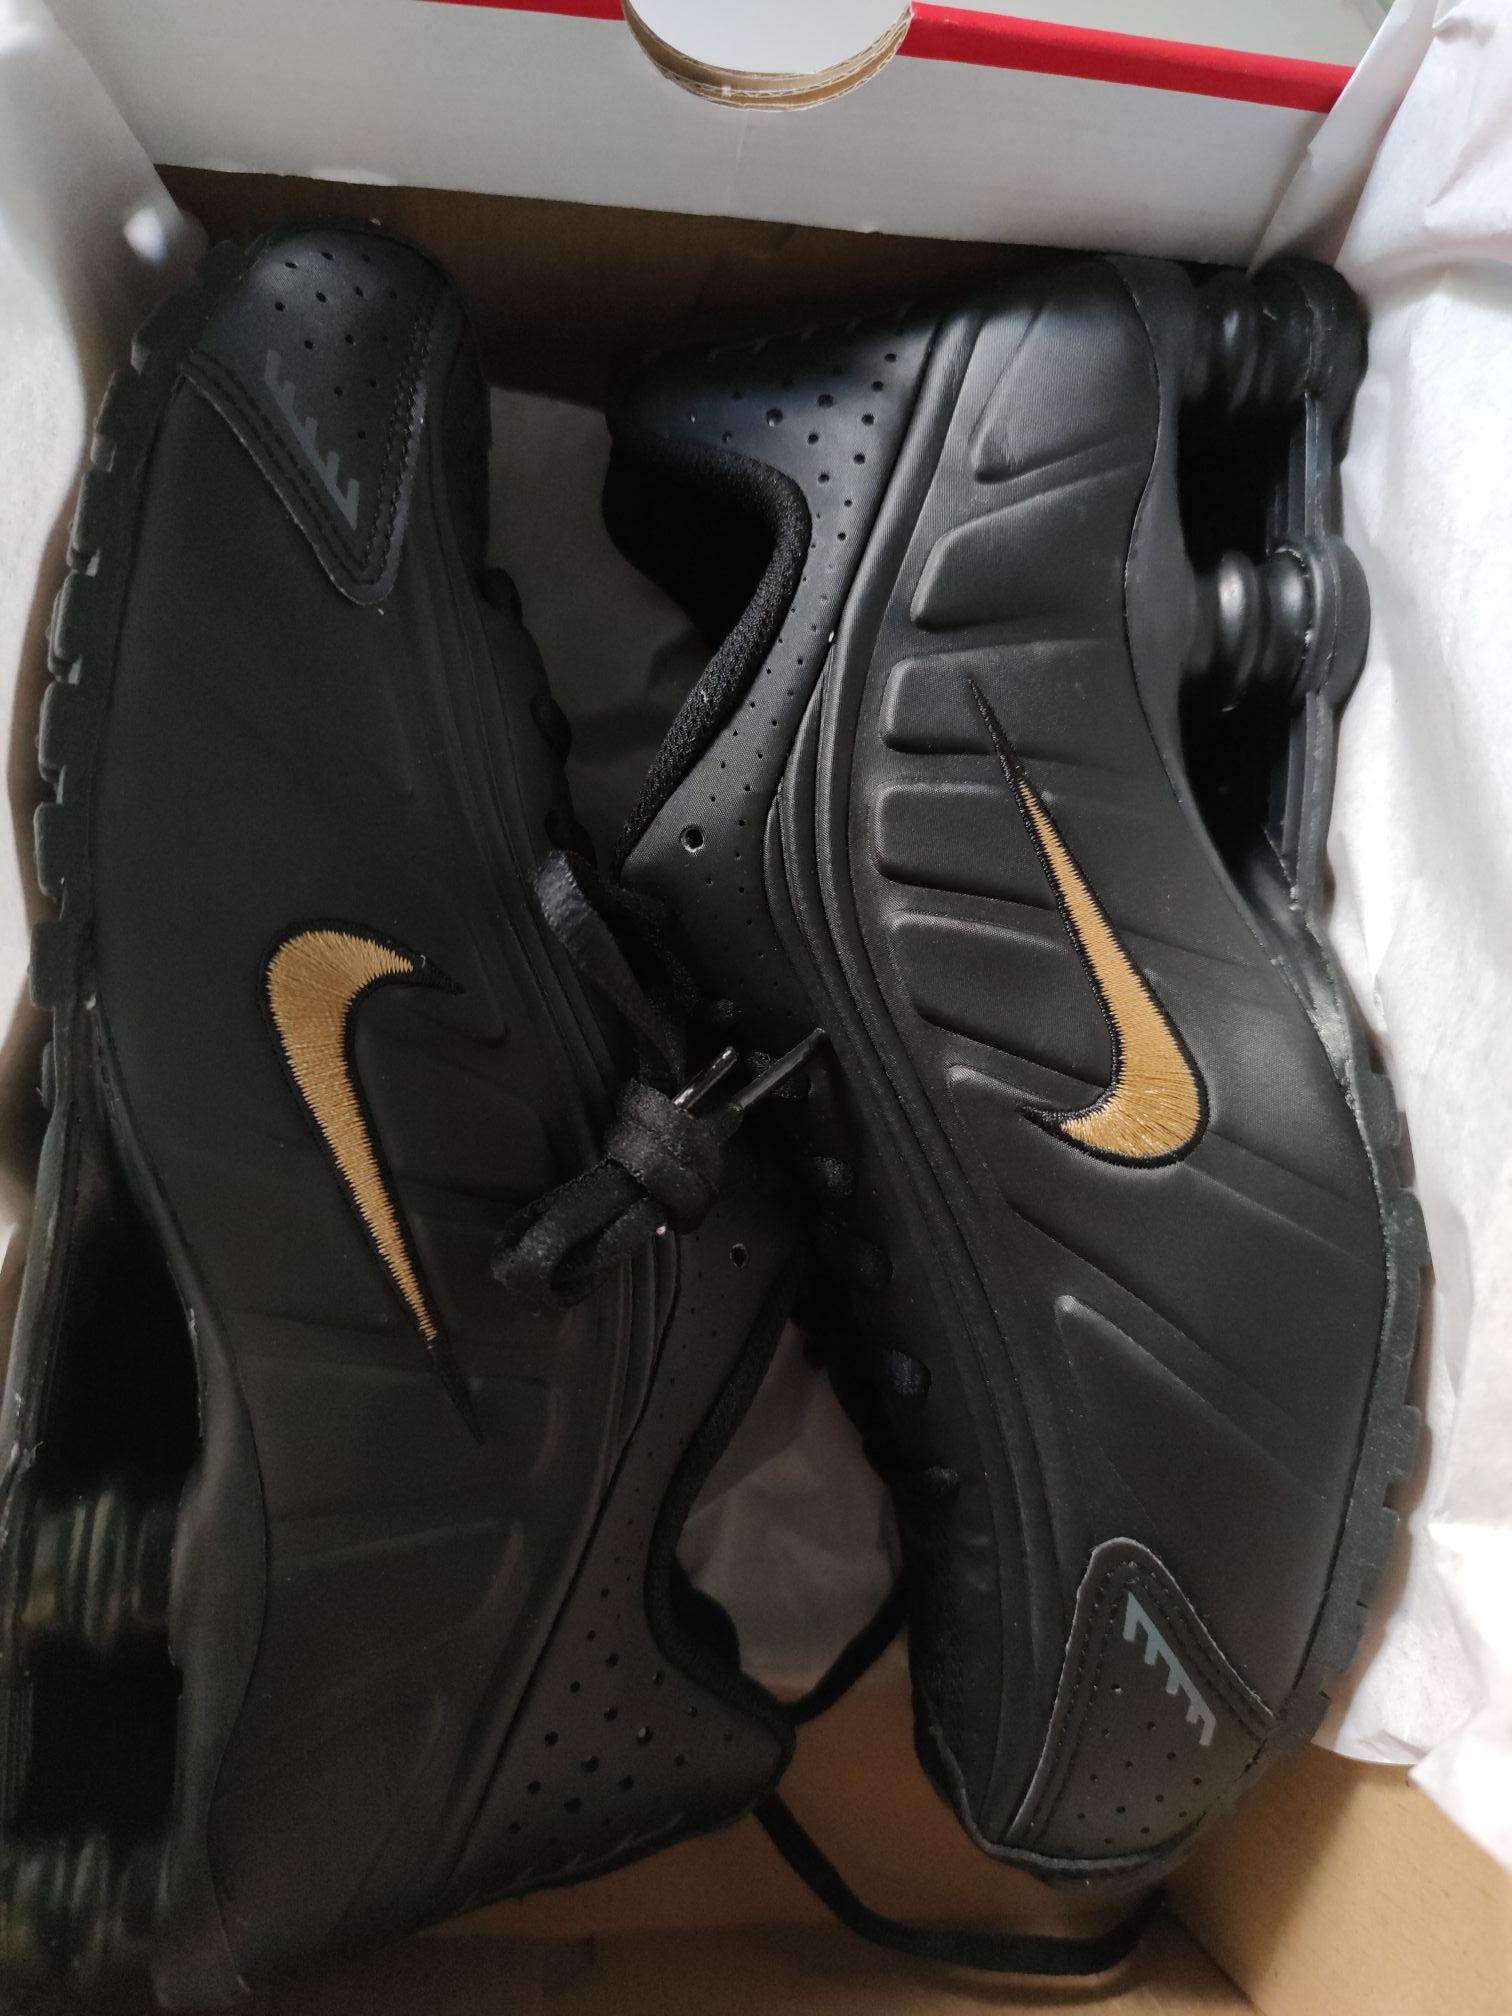 Nike shox R4 (ha)